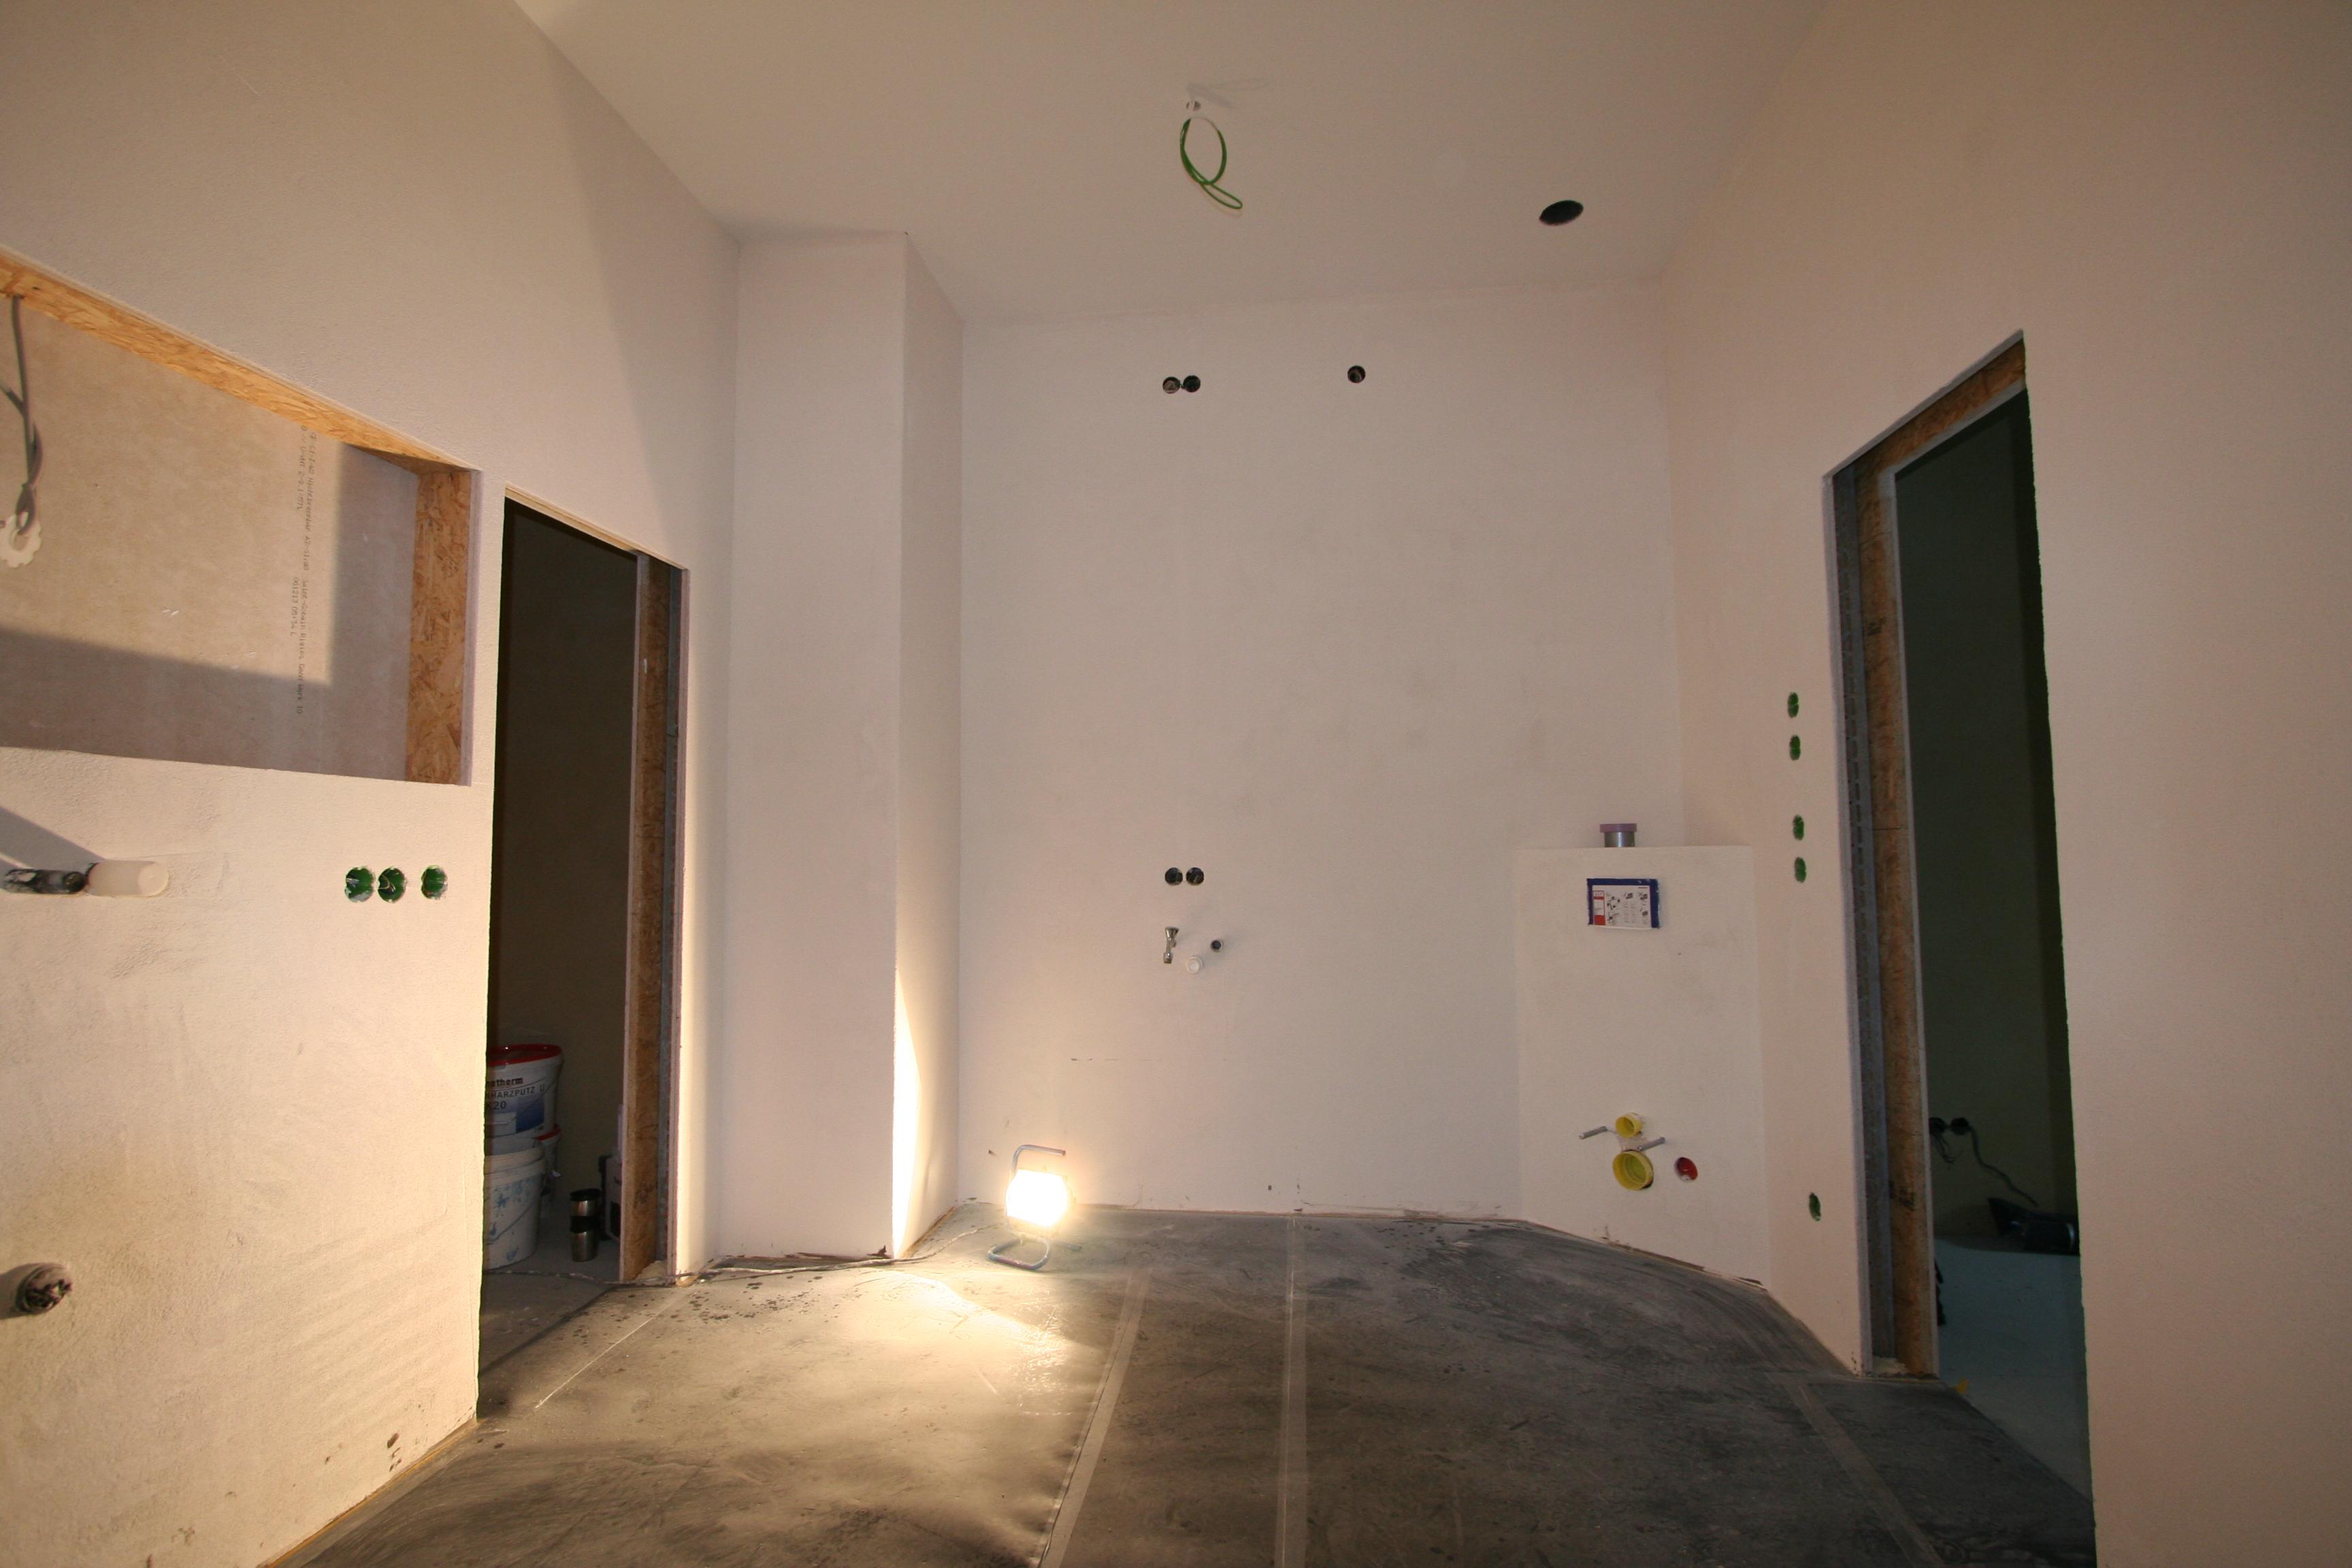 gestalten eines bades mit tadelakt fresco raumgestaltung. Black Bedroom Furniture Sets. Home Design Ideas